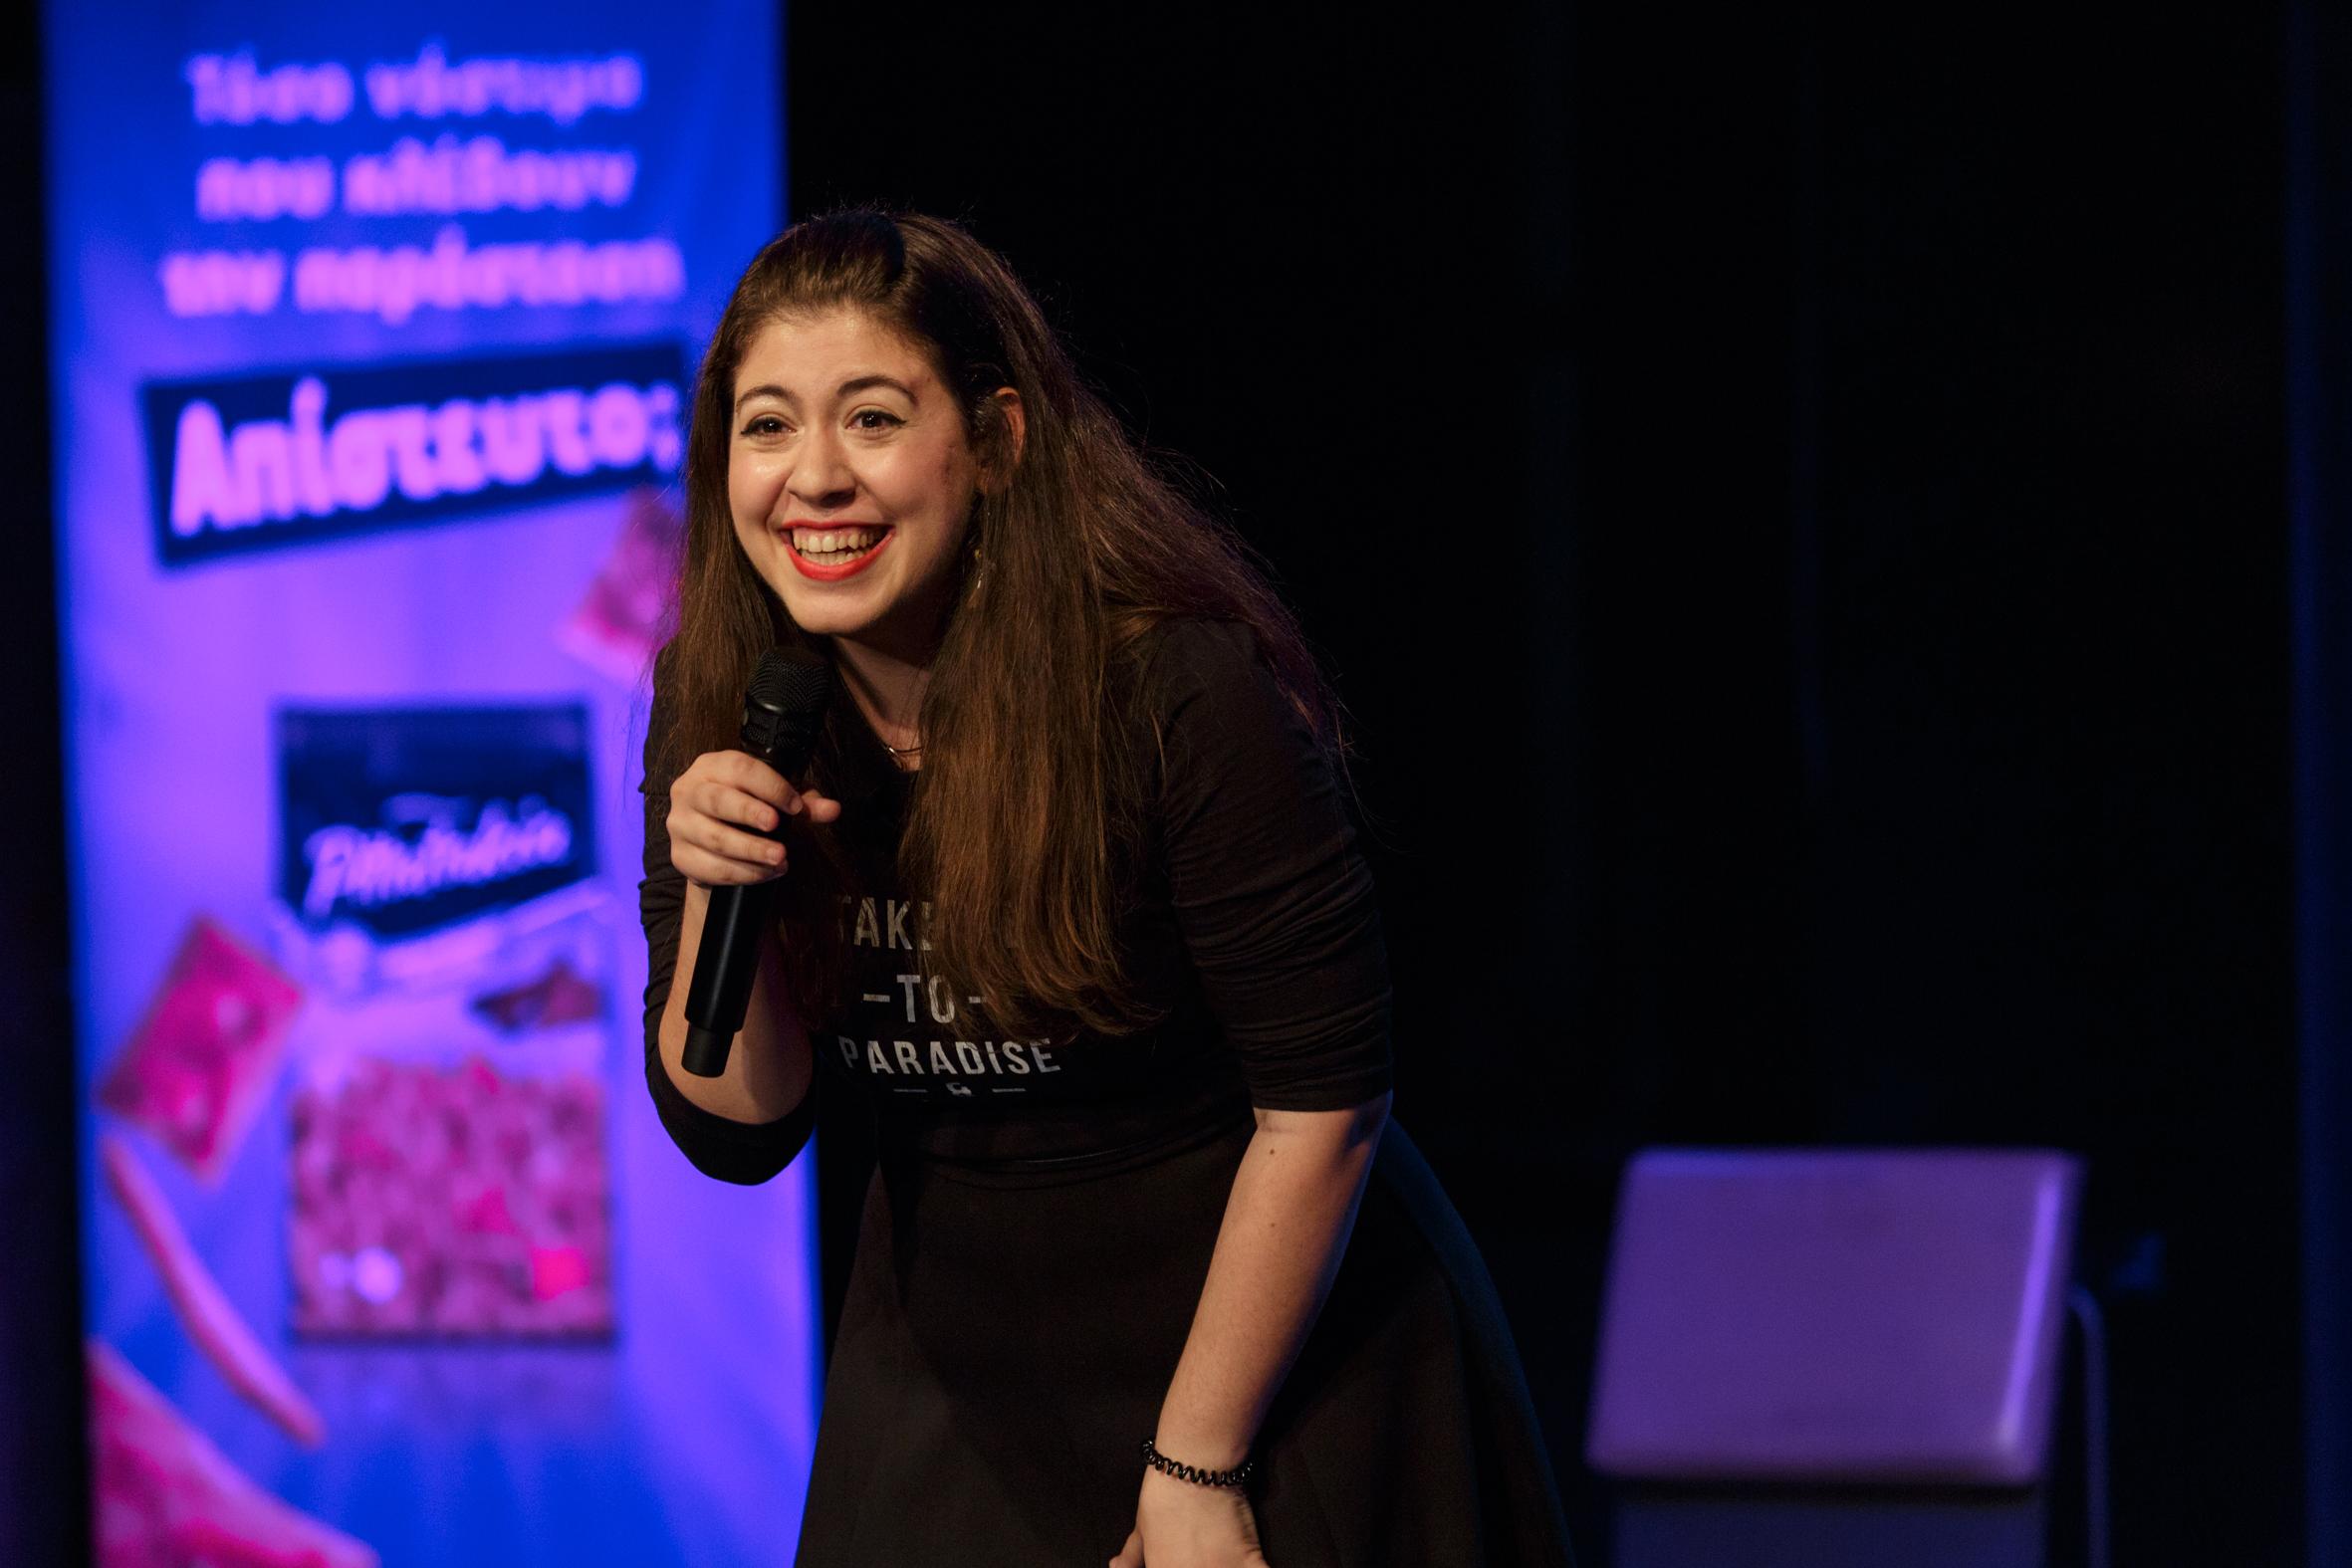 Aliki Tsakoumi performing at Athens international comedy festival